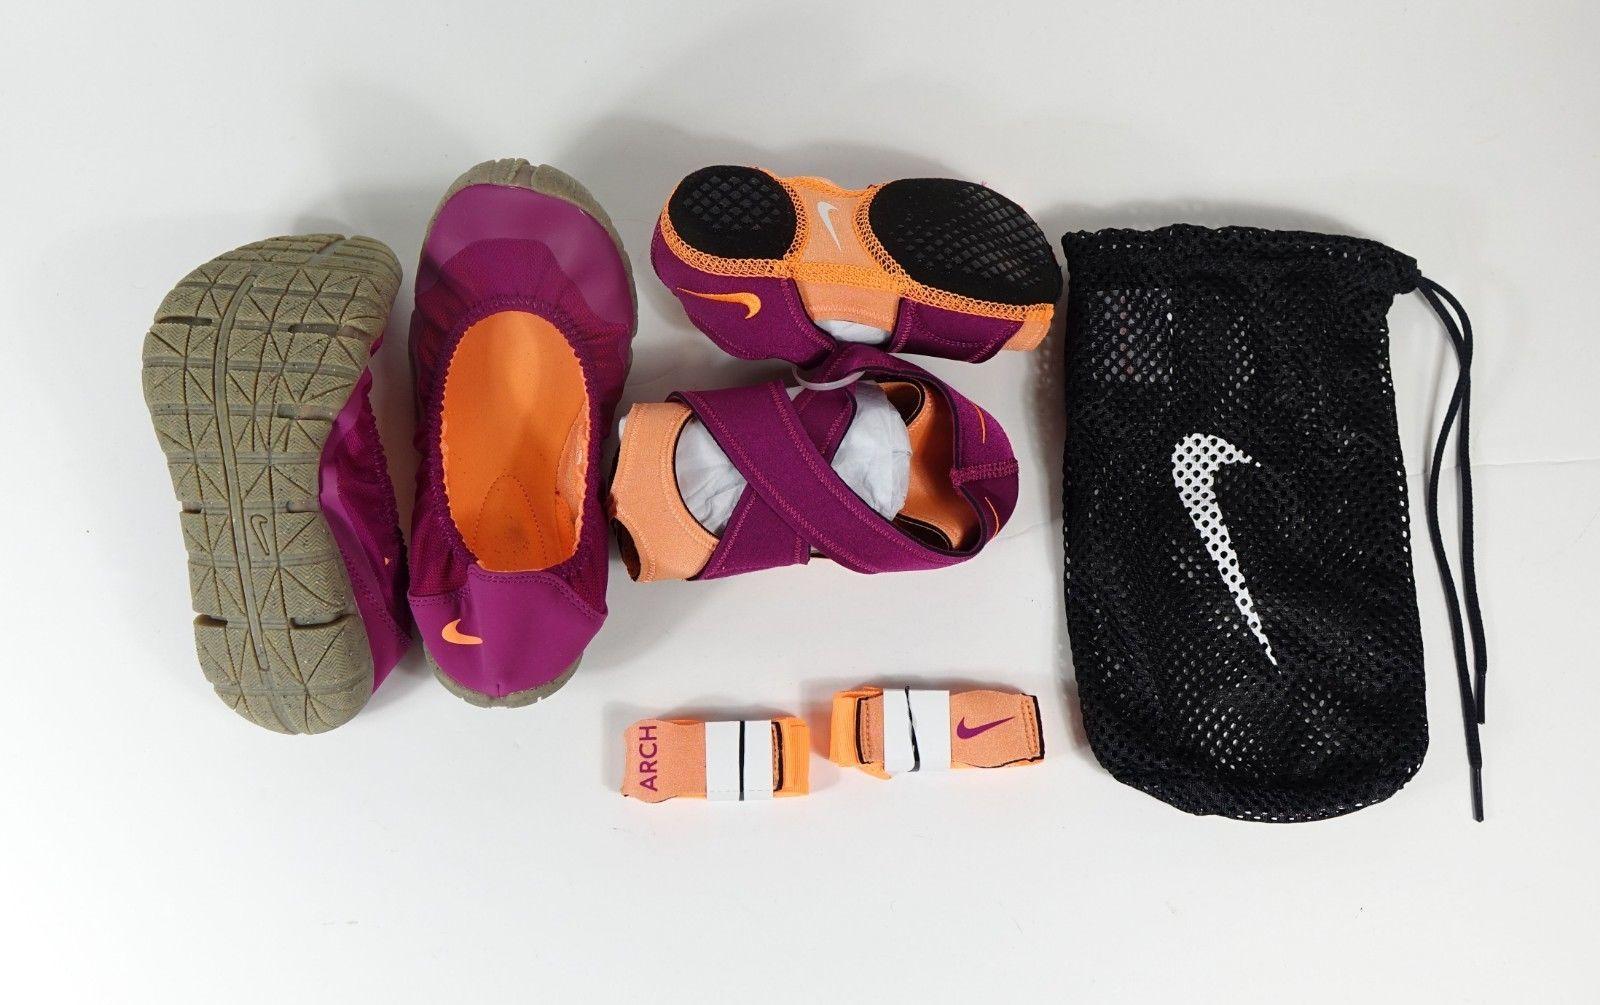 1da6ca8395 Nike Studio Wrap Pack Magenta Orange Yoga and 50 similar items. 57